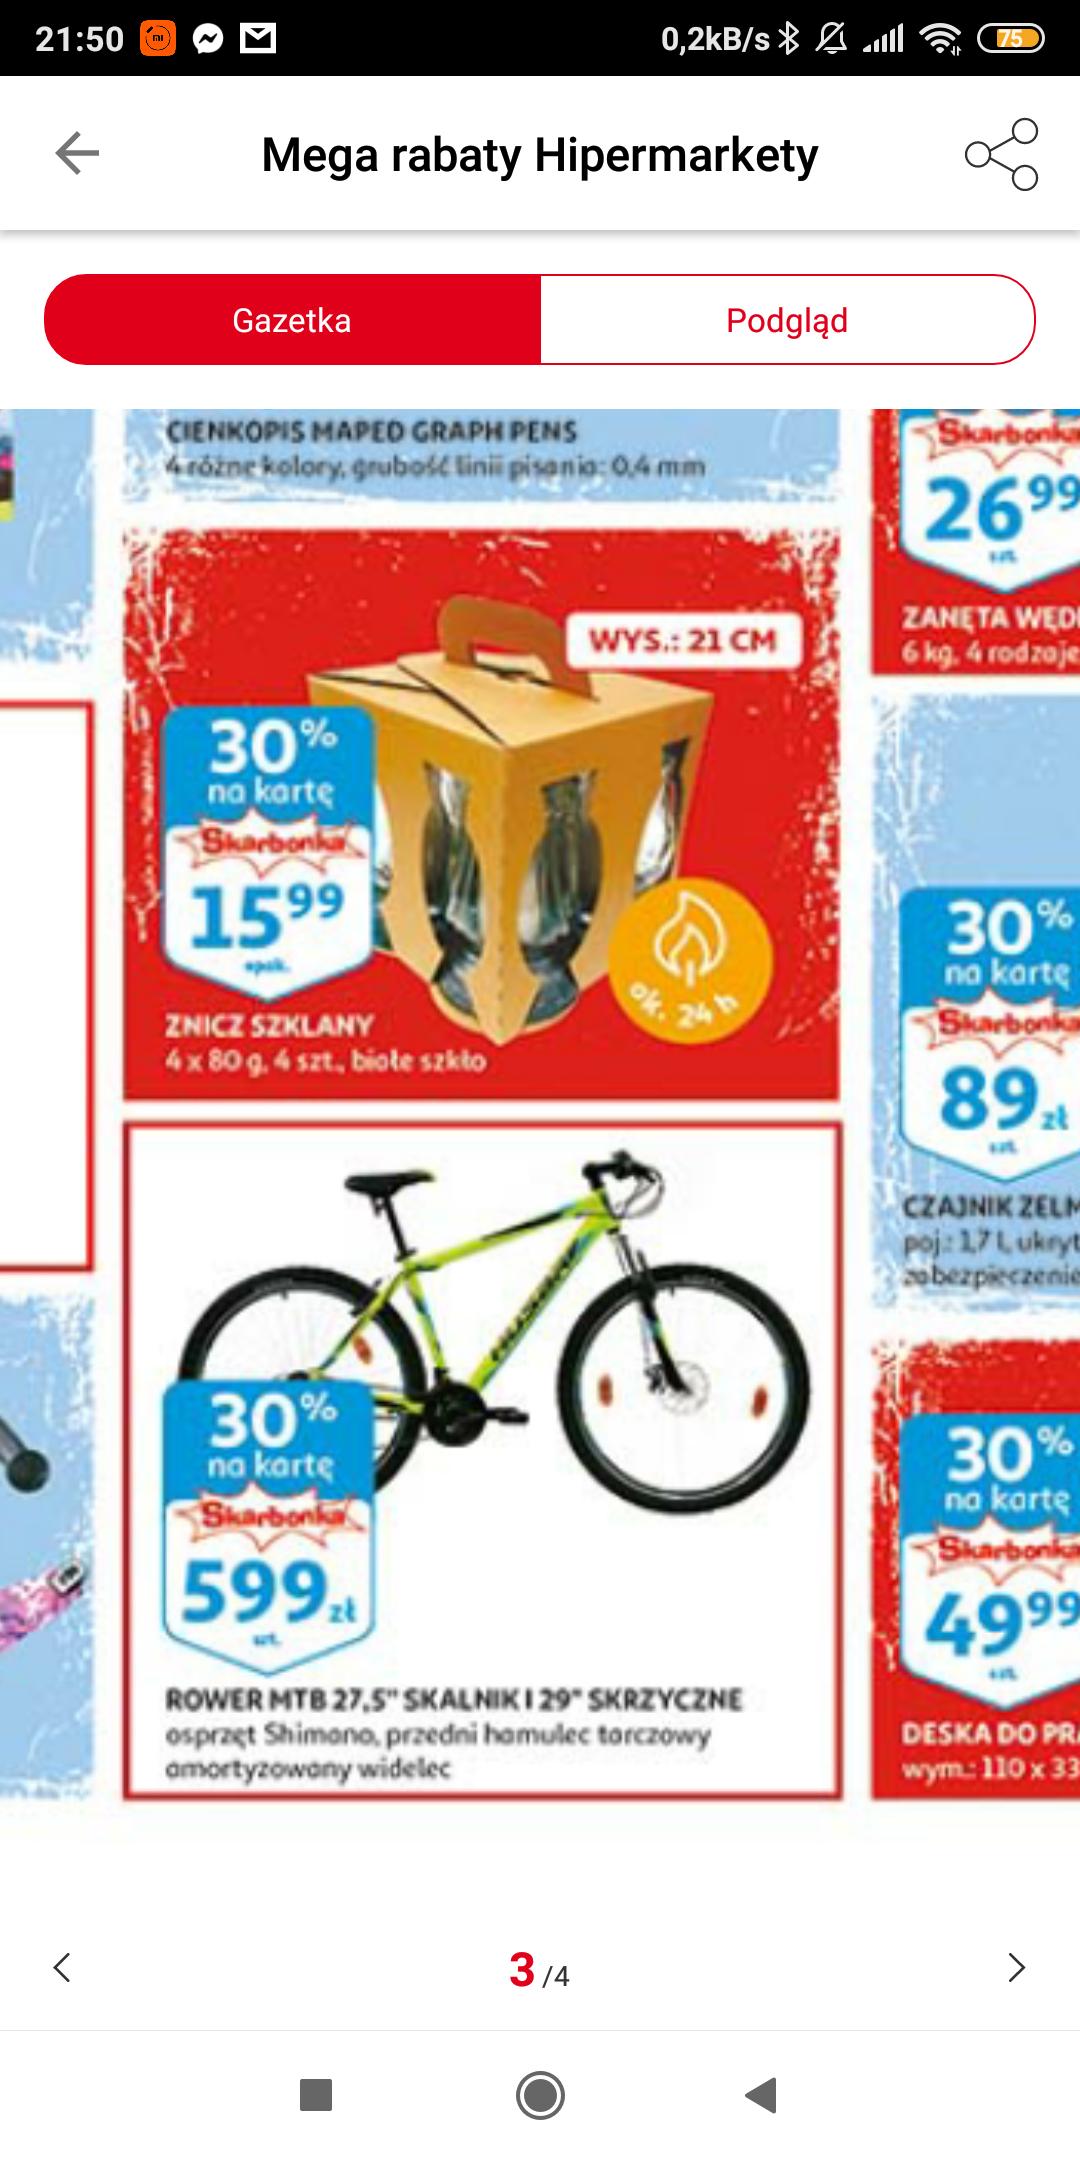 Auchan rower MTB Skalnik 27,5 i 30% na kartę Skarbonka